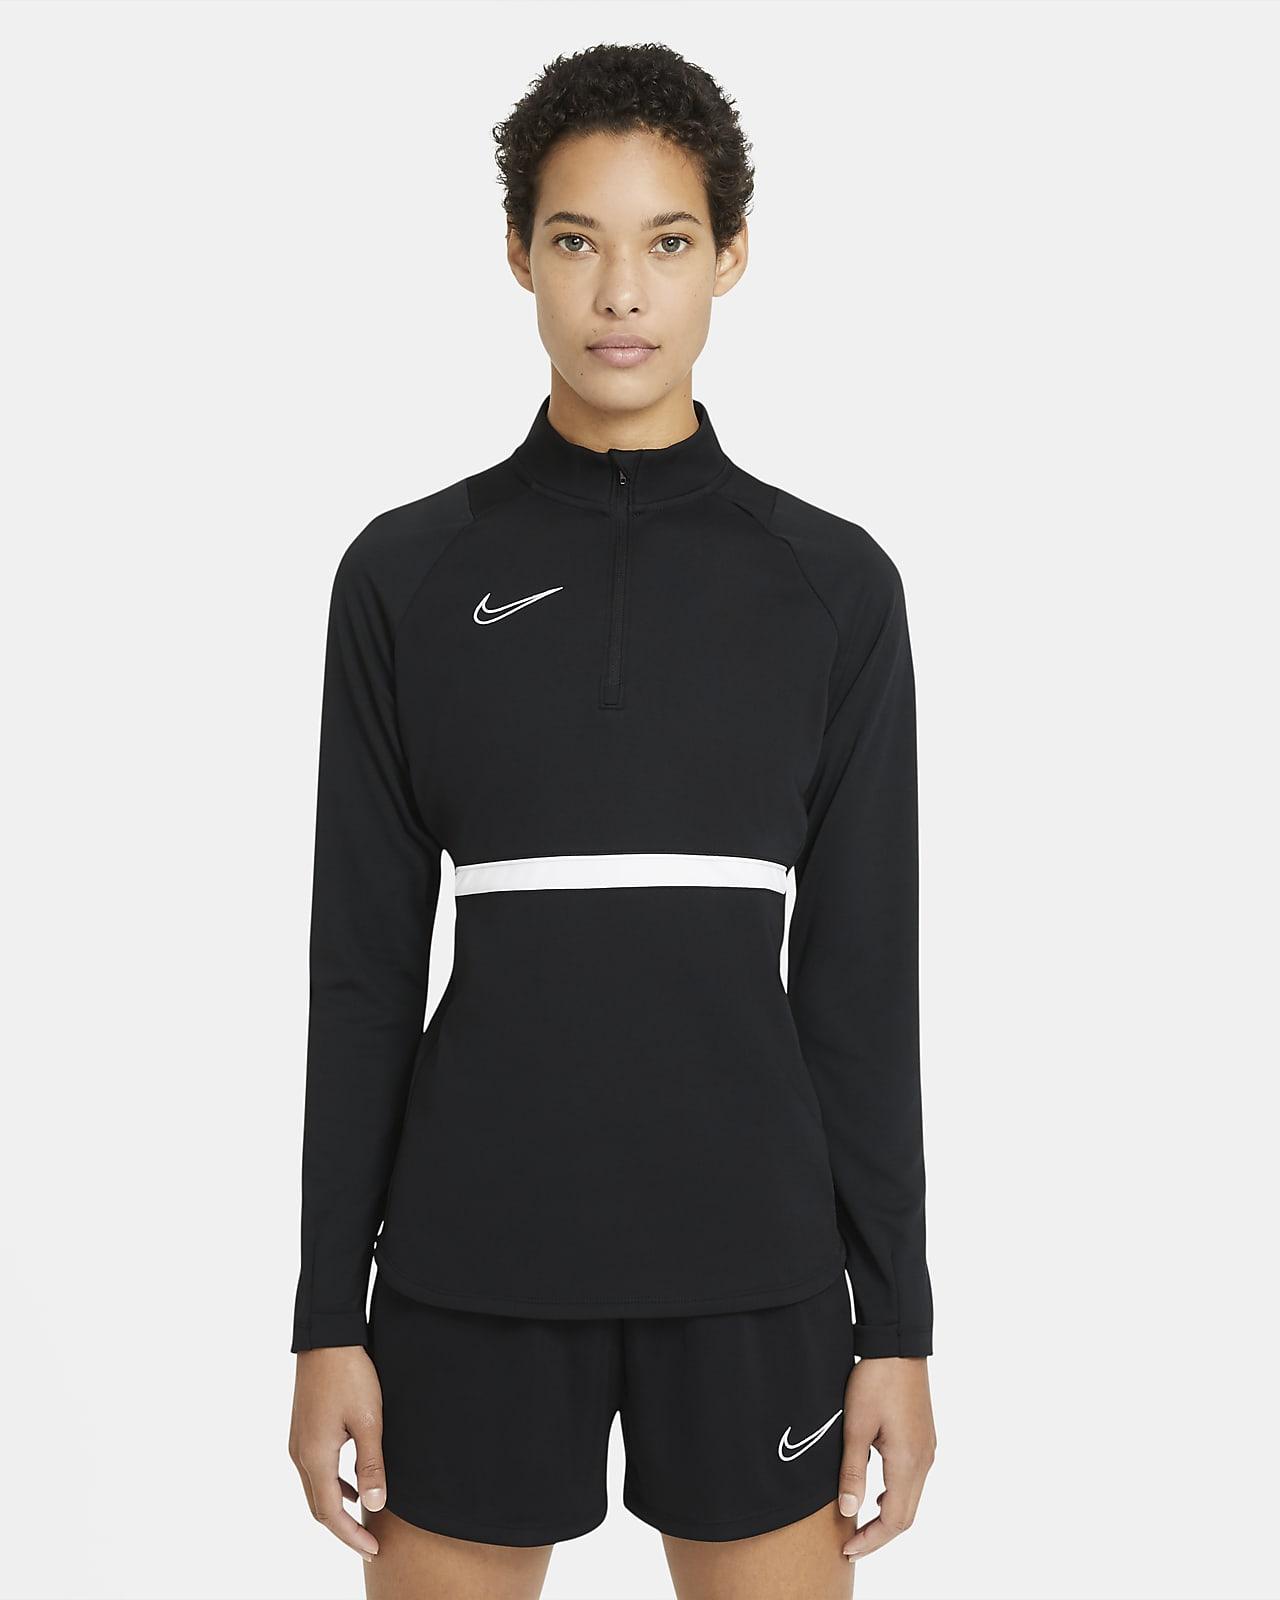 Nike Dri-FIT Academy Voetbaltrainingstop voor dames